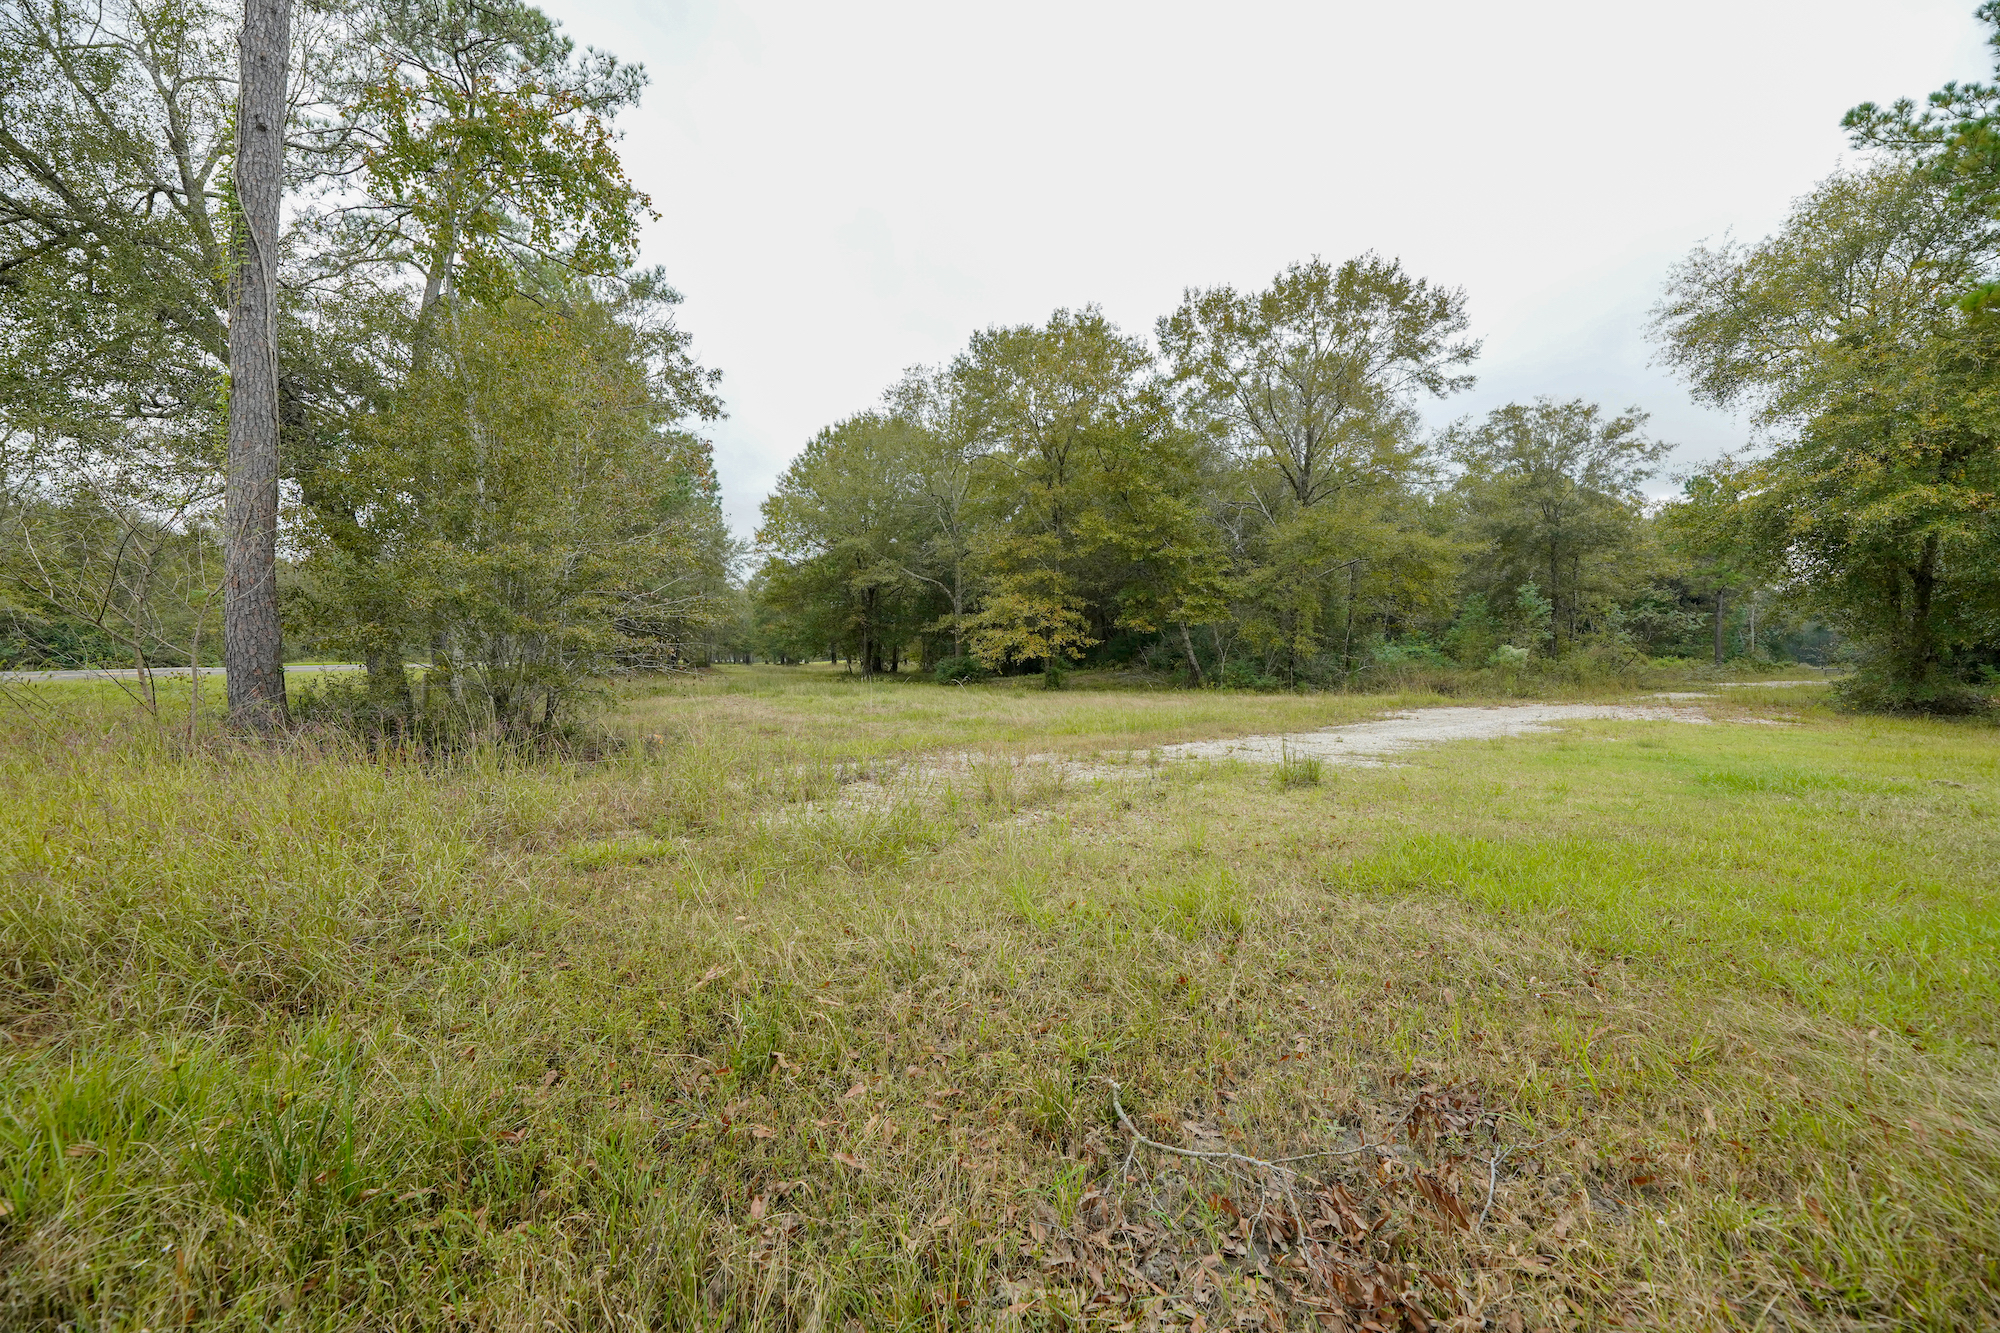 Jefferson County Development Land - Image 34 of 36